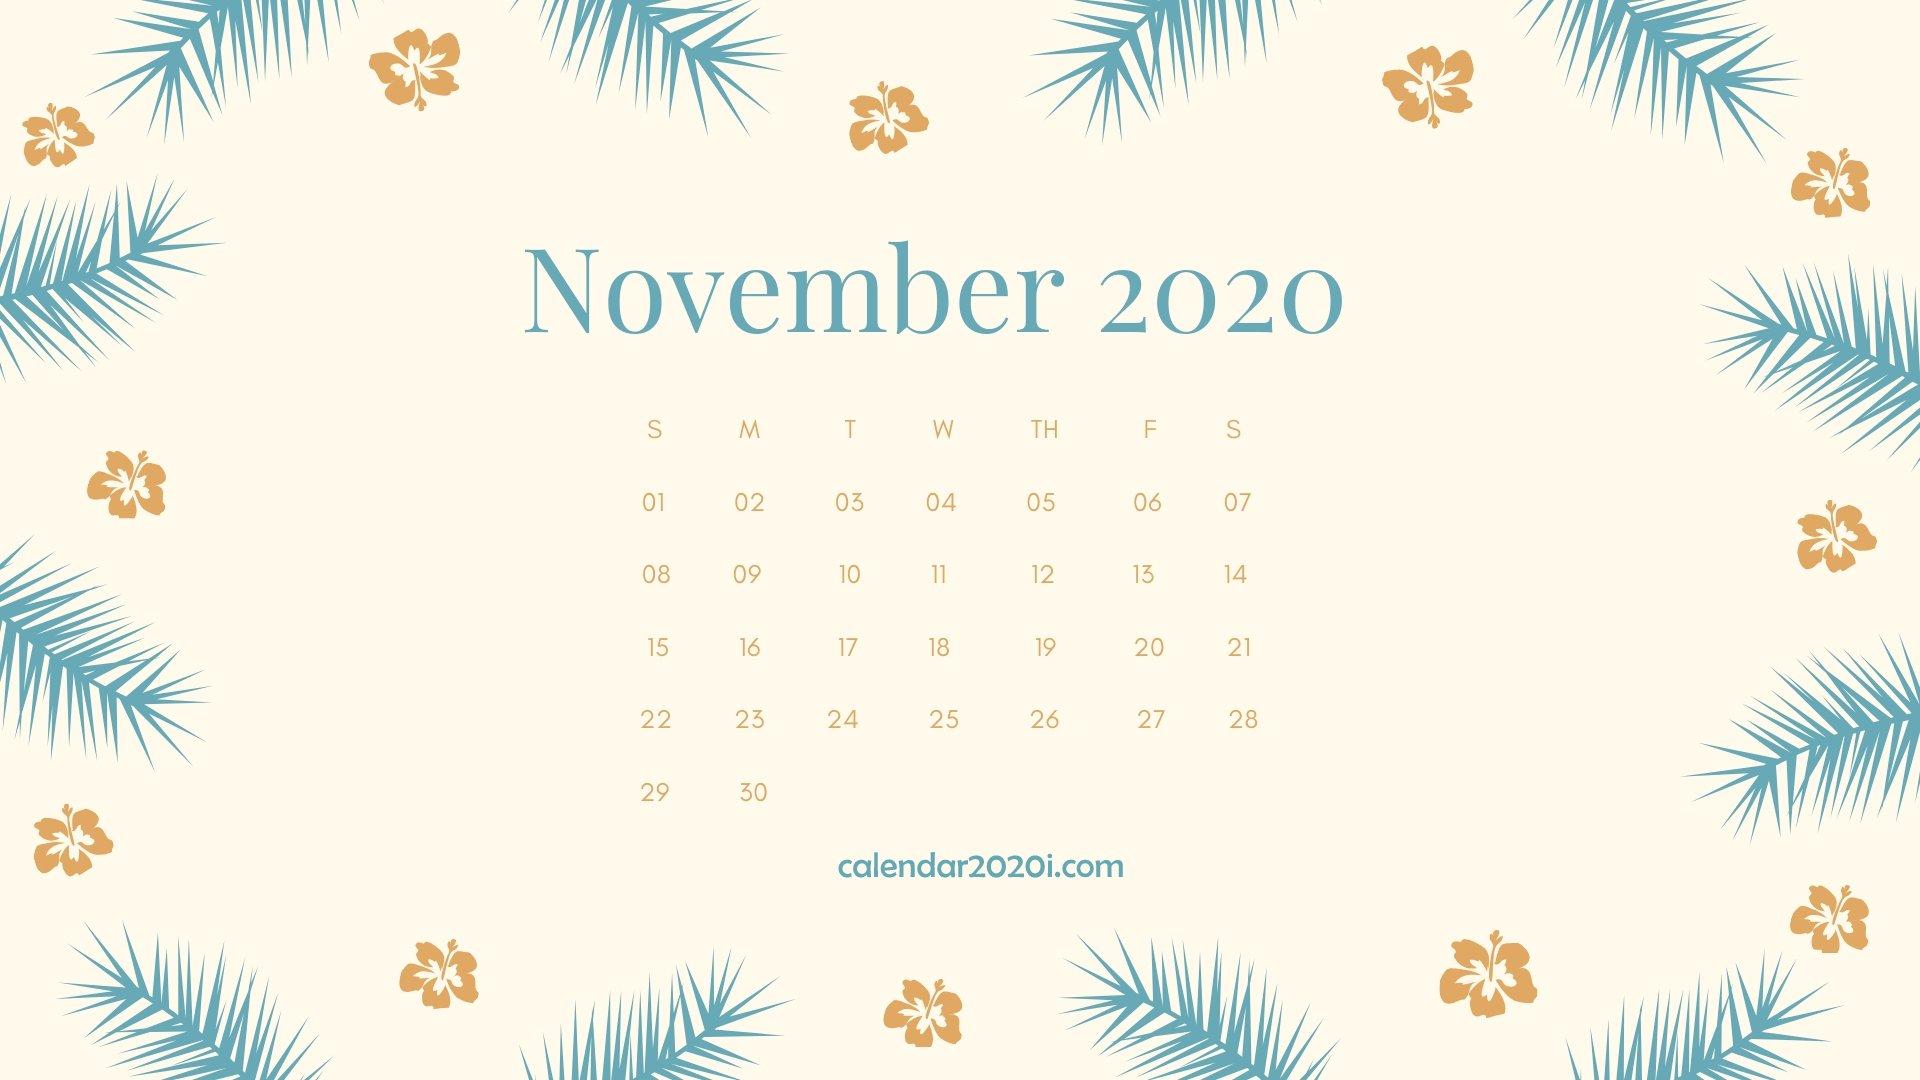 November 2020 Calendar Desktop Wallpaper